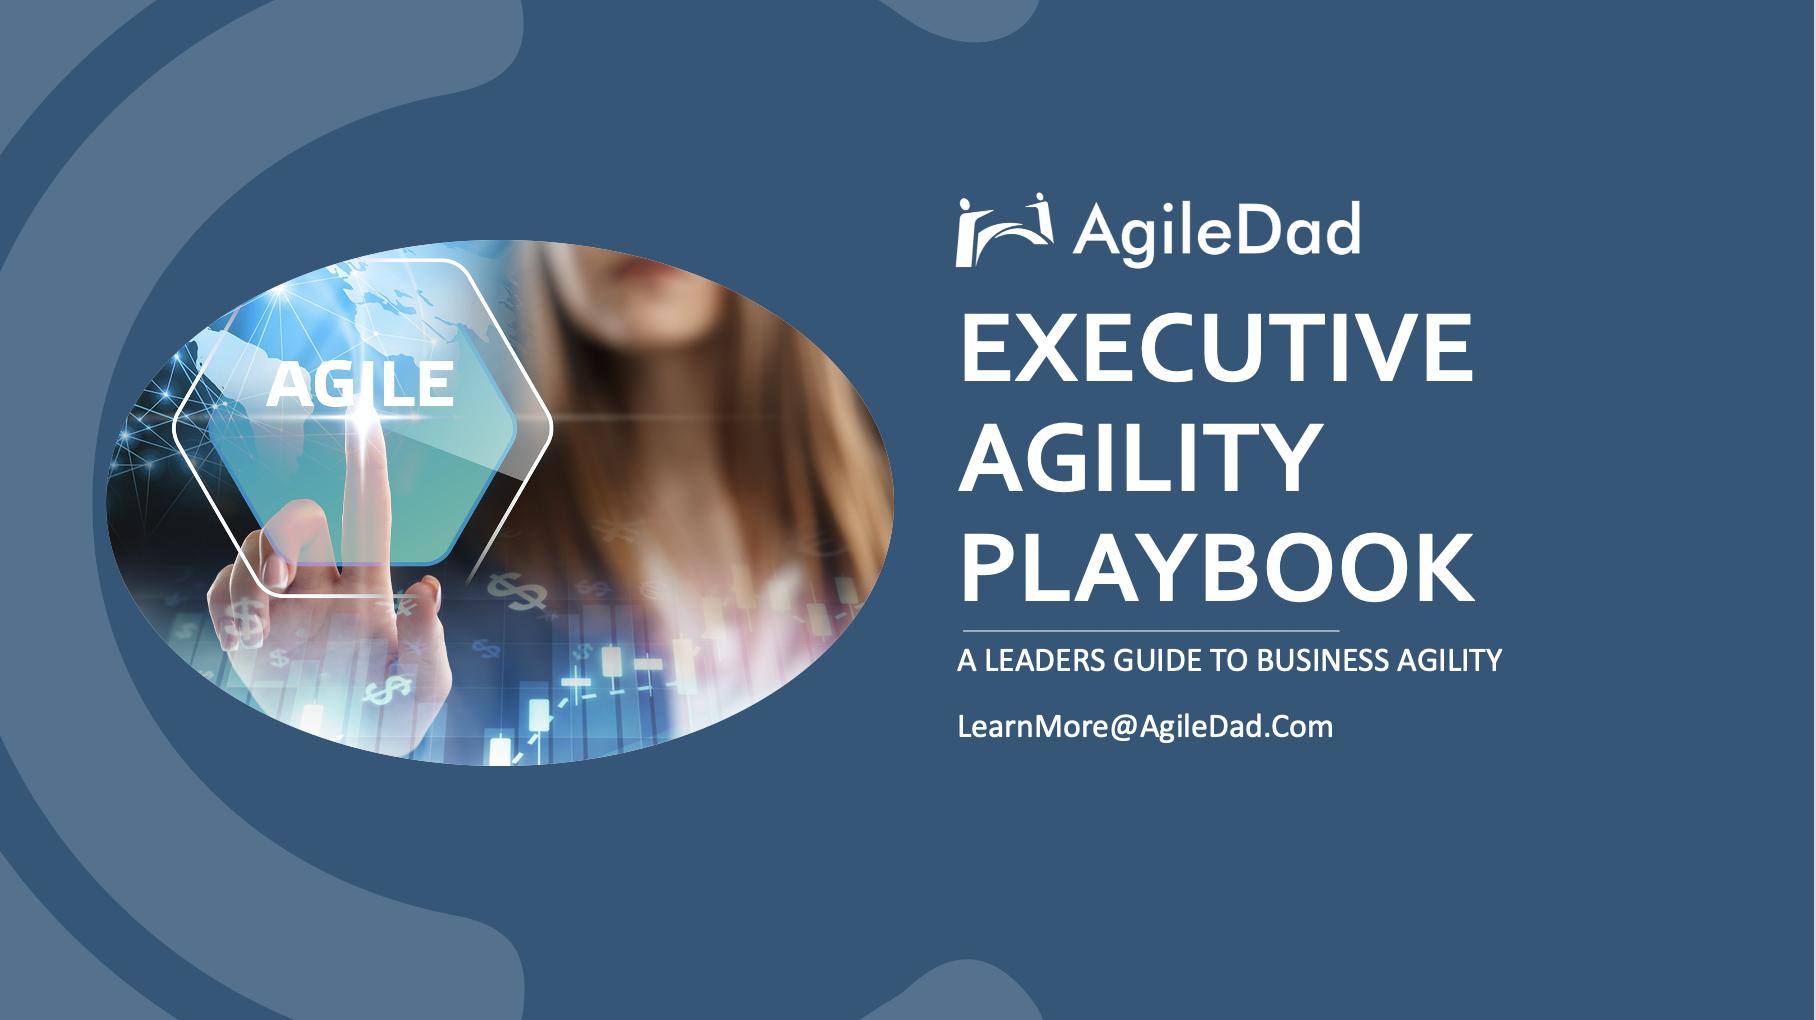 Executive Agility Playbook